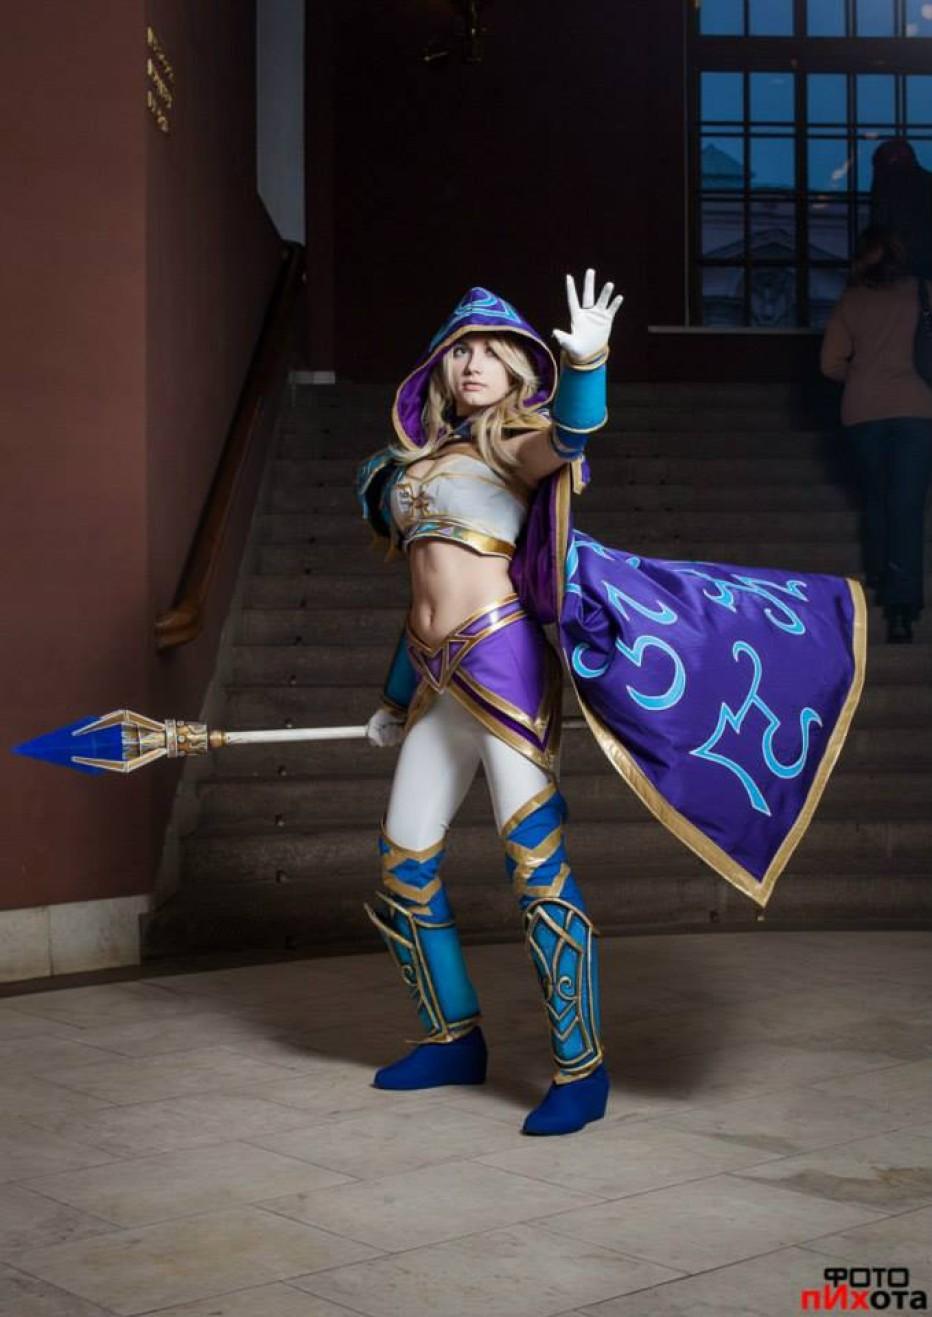 Warcraft-III-Jaina-Proudmoore-Narga-Cosplay-Gamers-Heroes-5.jpg